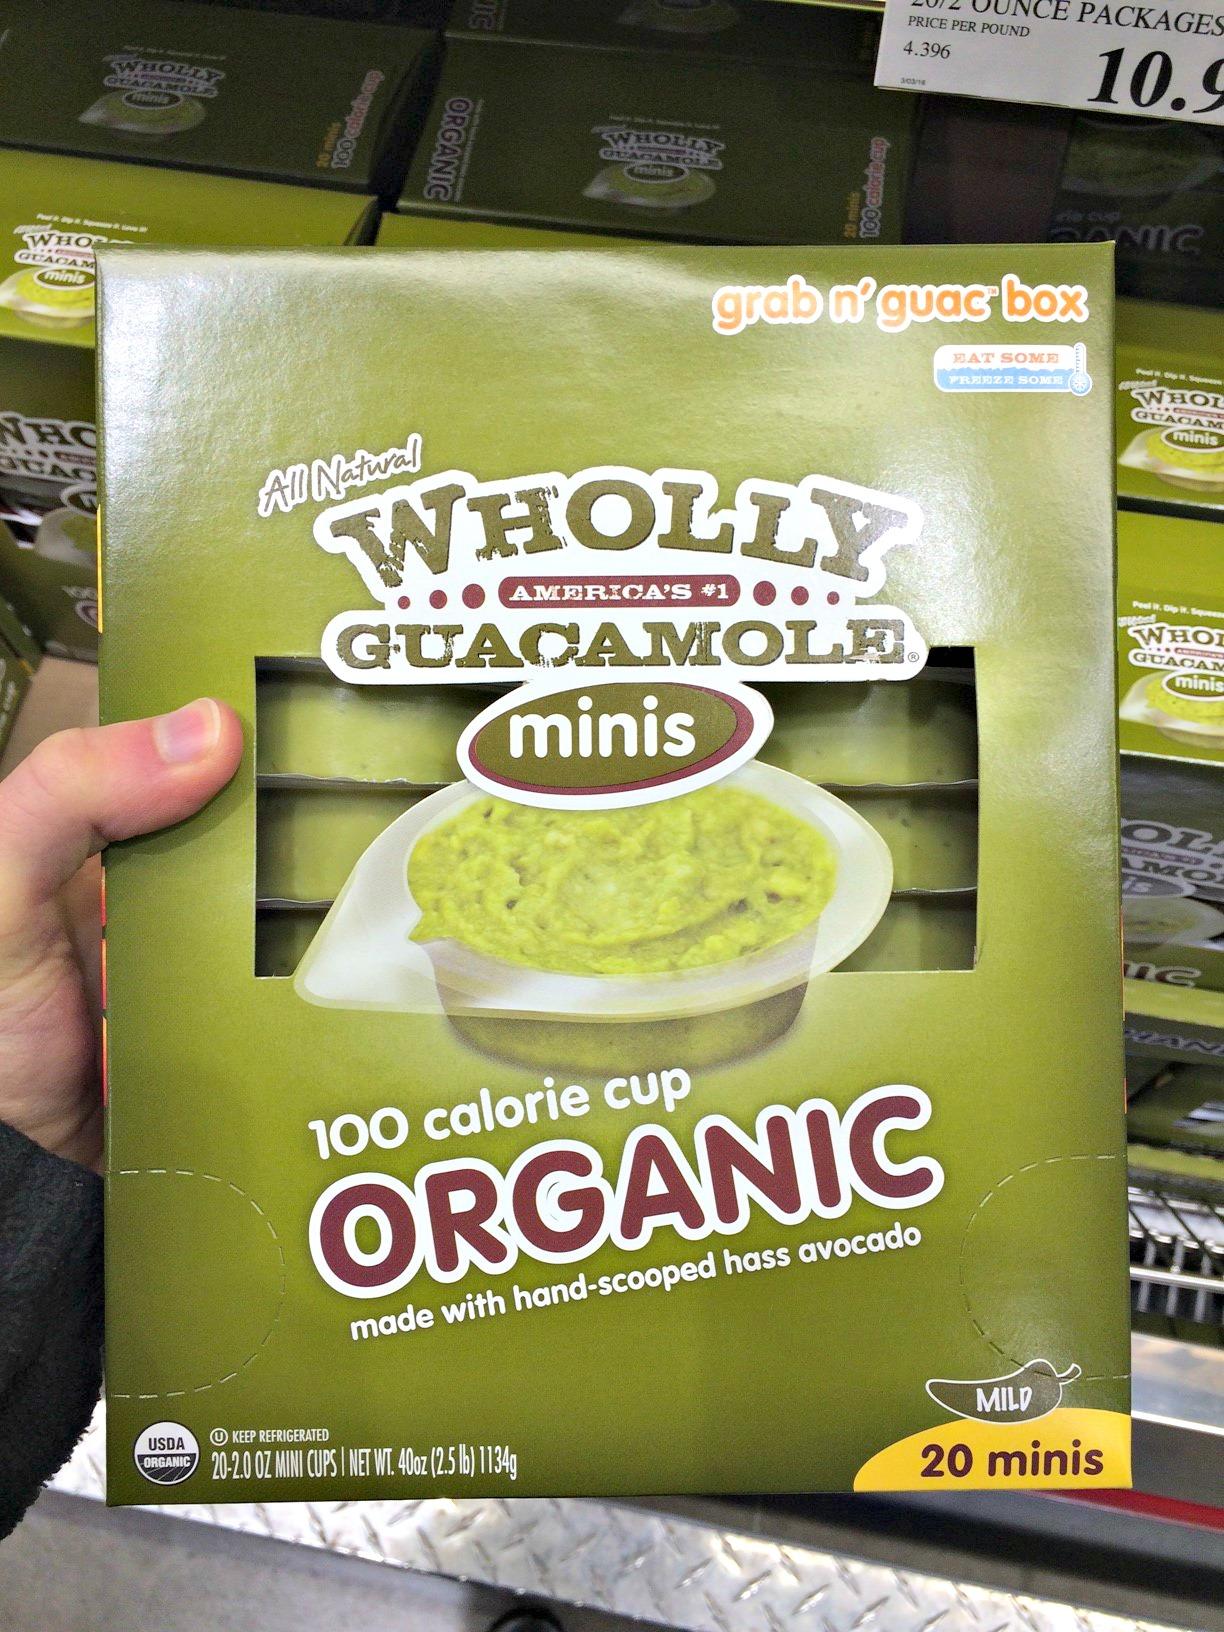 keto snack find: wholly guacamole minis bulk pack at costco : keto